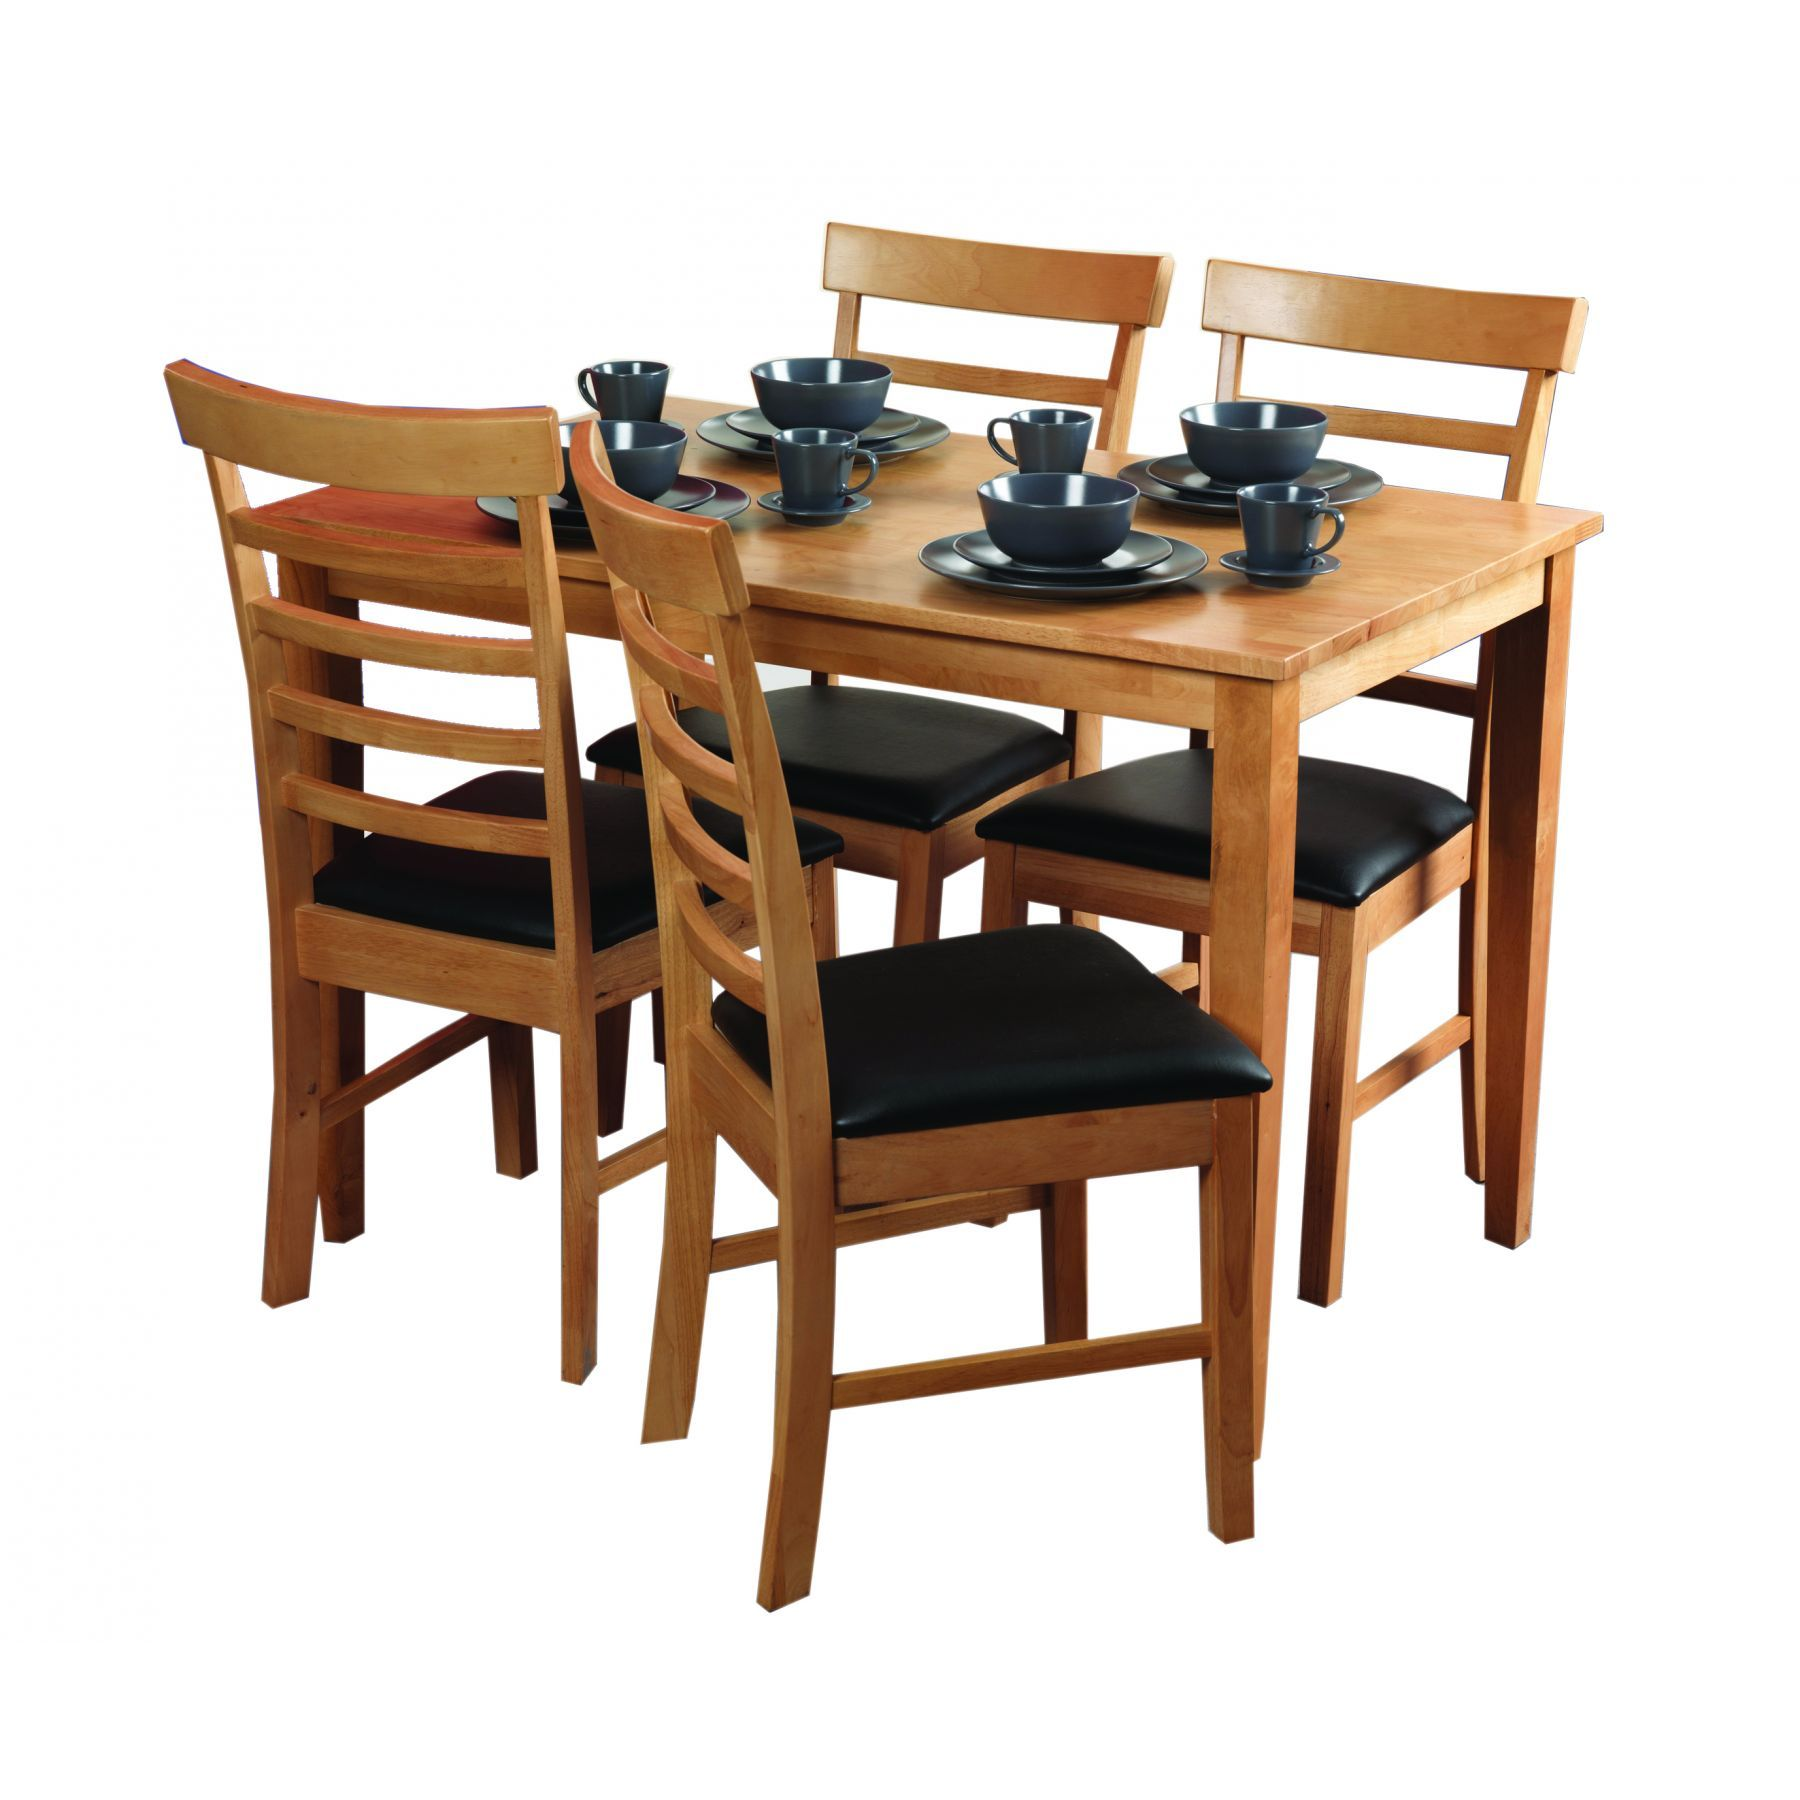 Furniture Killeen TX   Contact At (254) 634 5900 Or Visit   Https